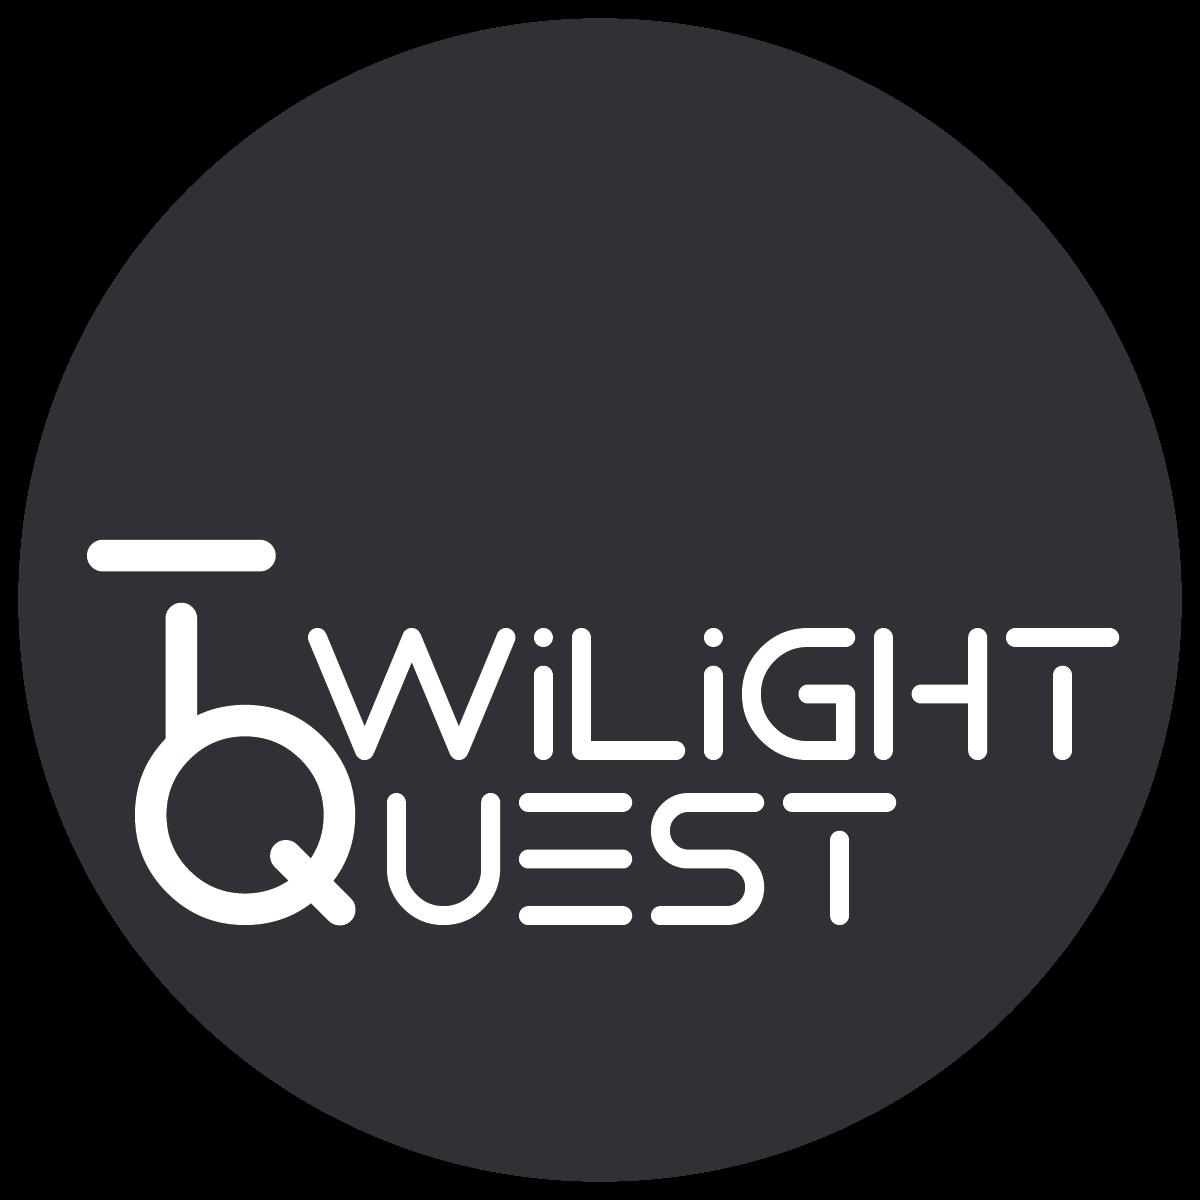 Twilight Quest logo